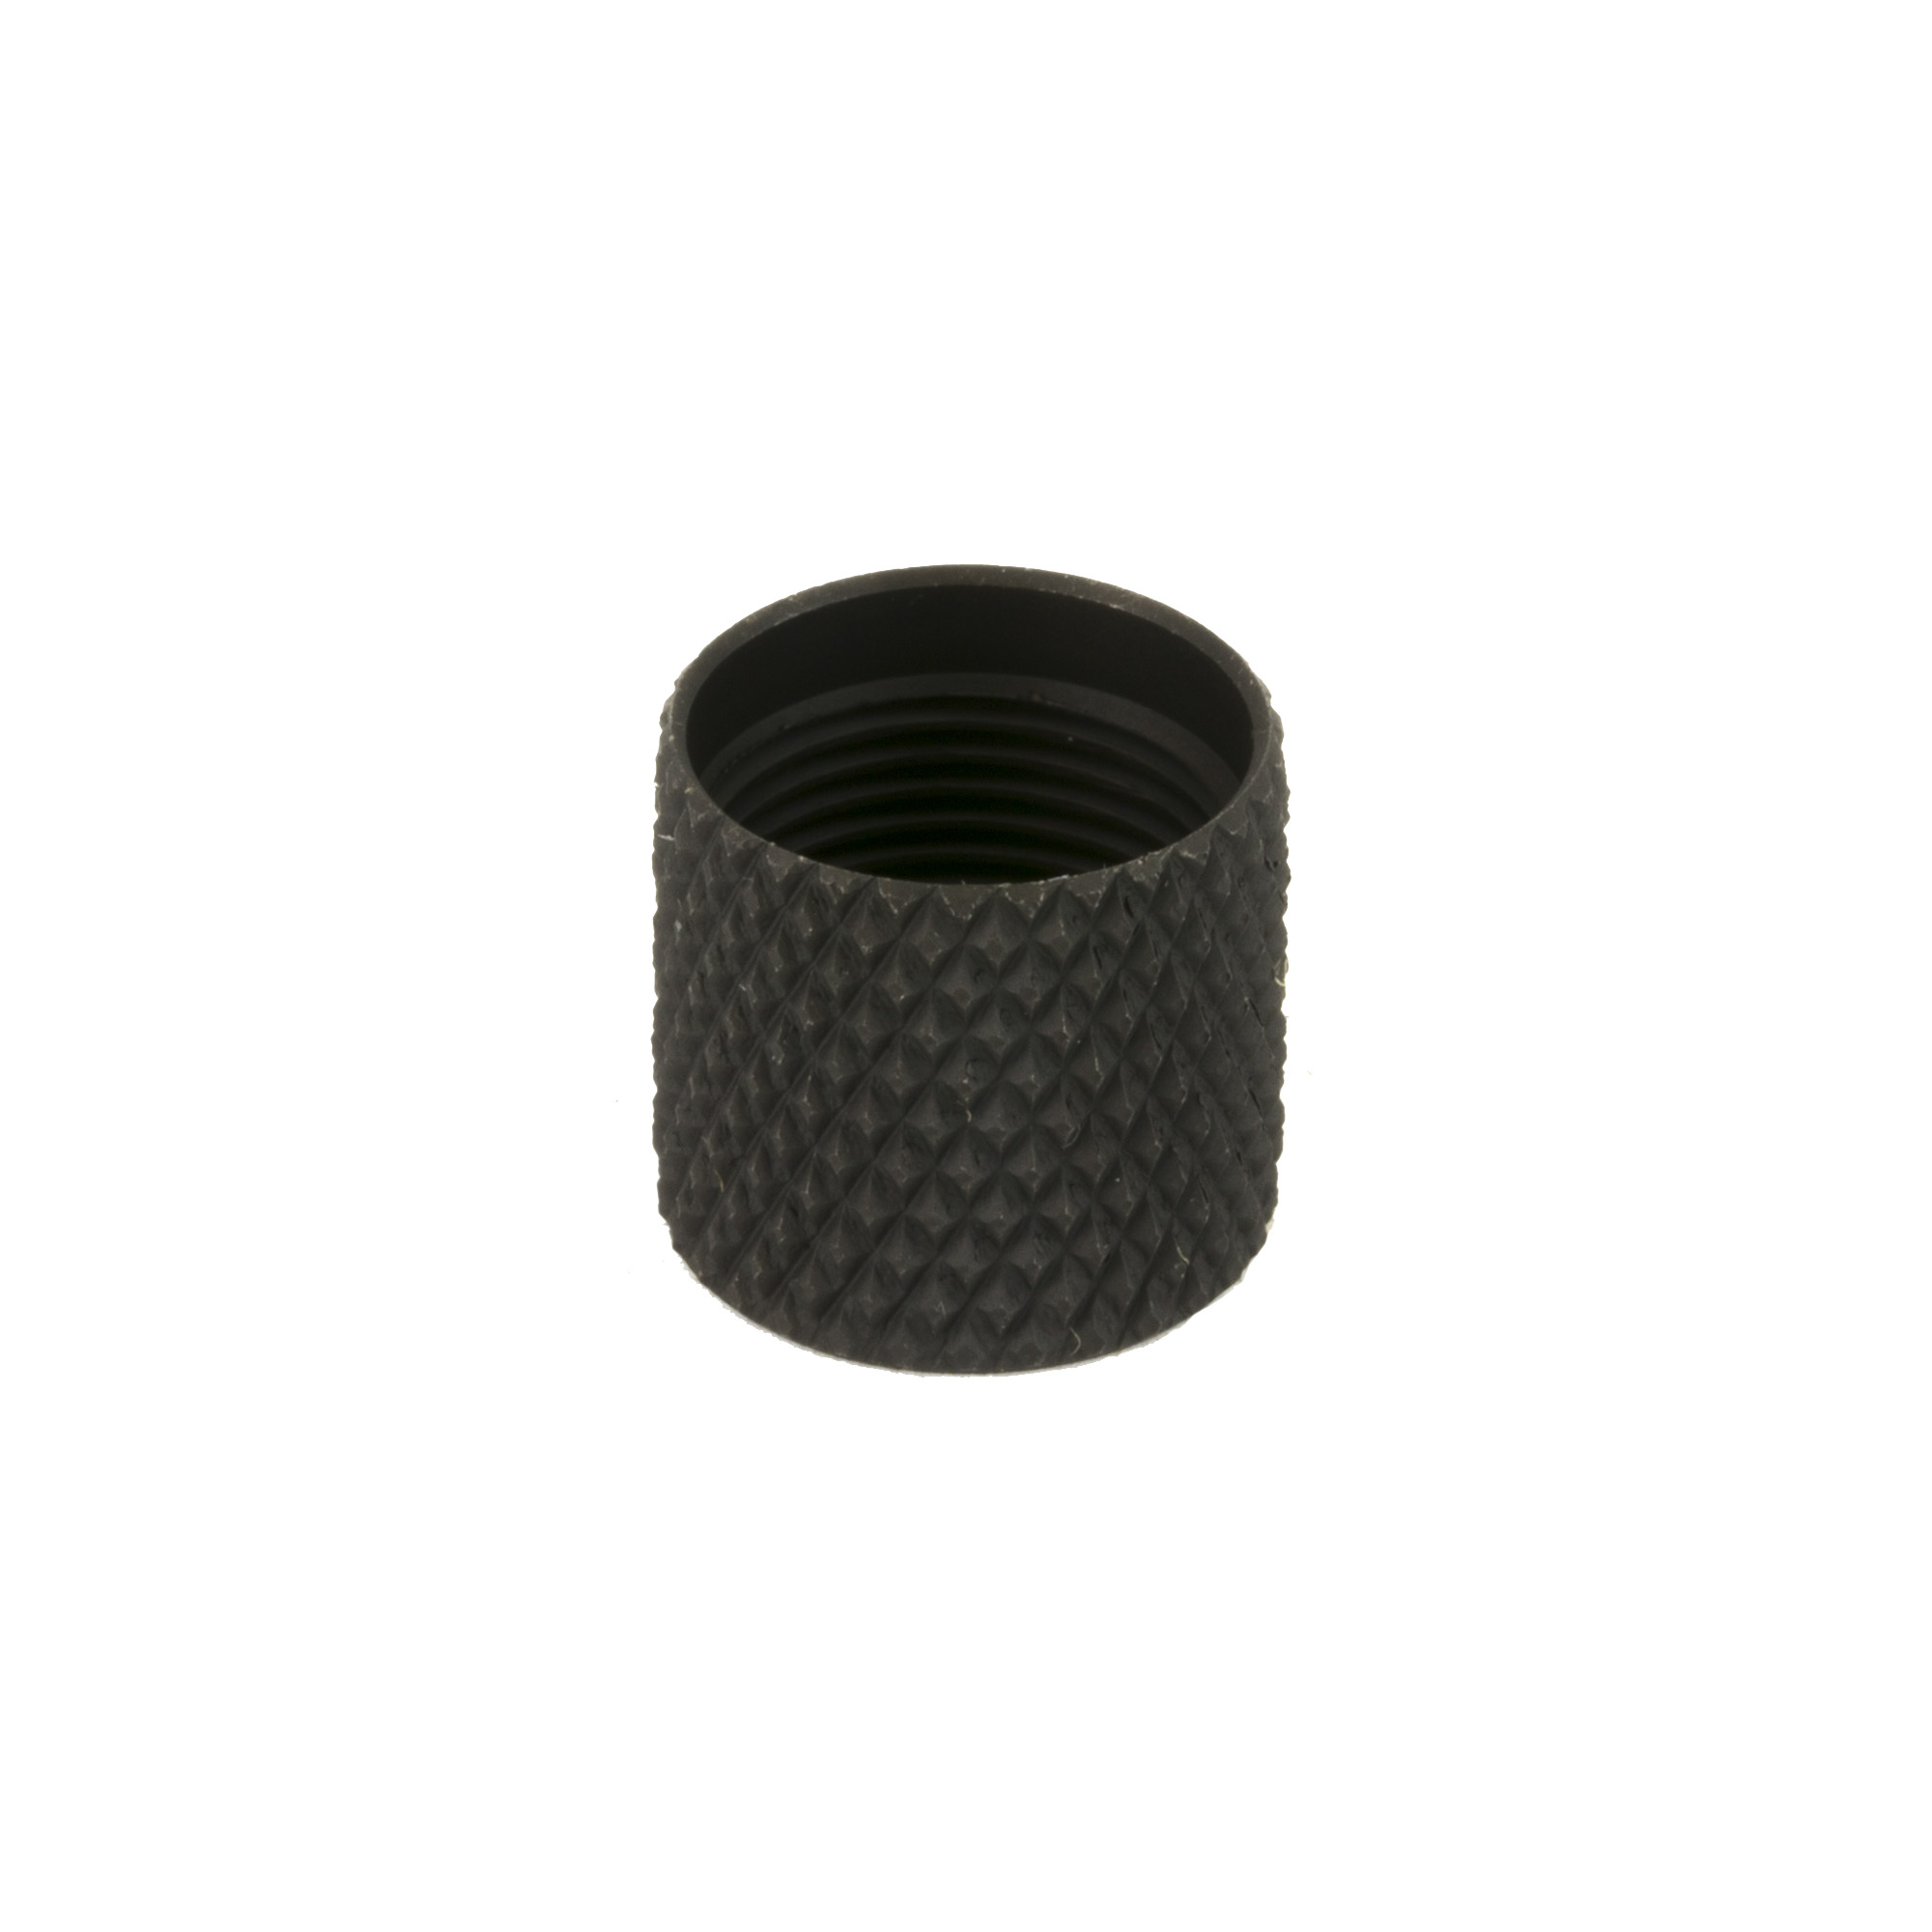 Yhm 9mm Pist Thr Prot 1/2x28 .570 Od